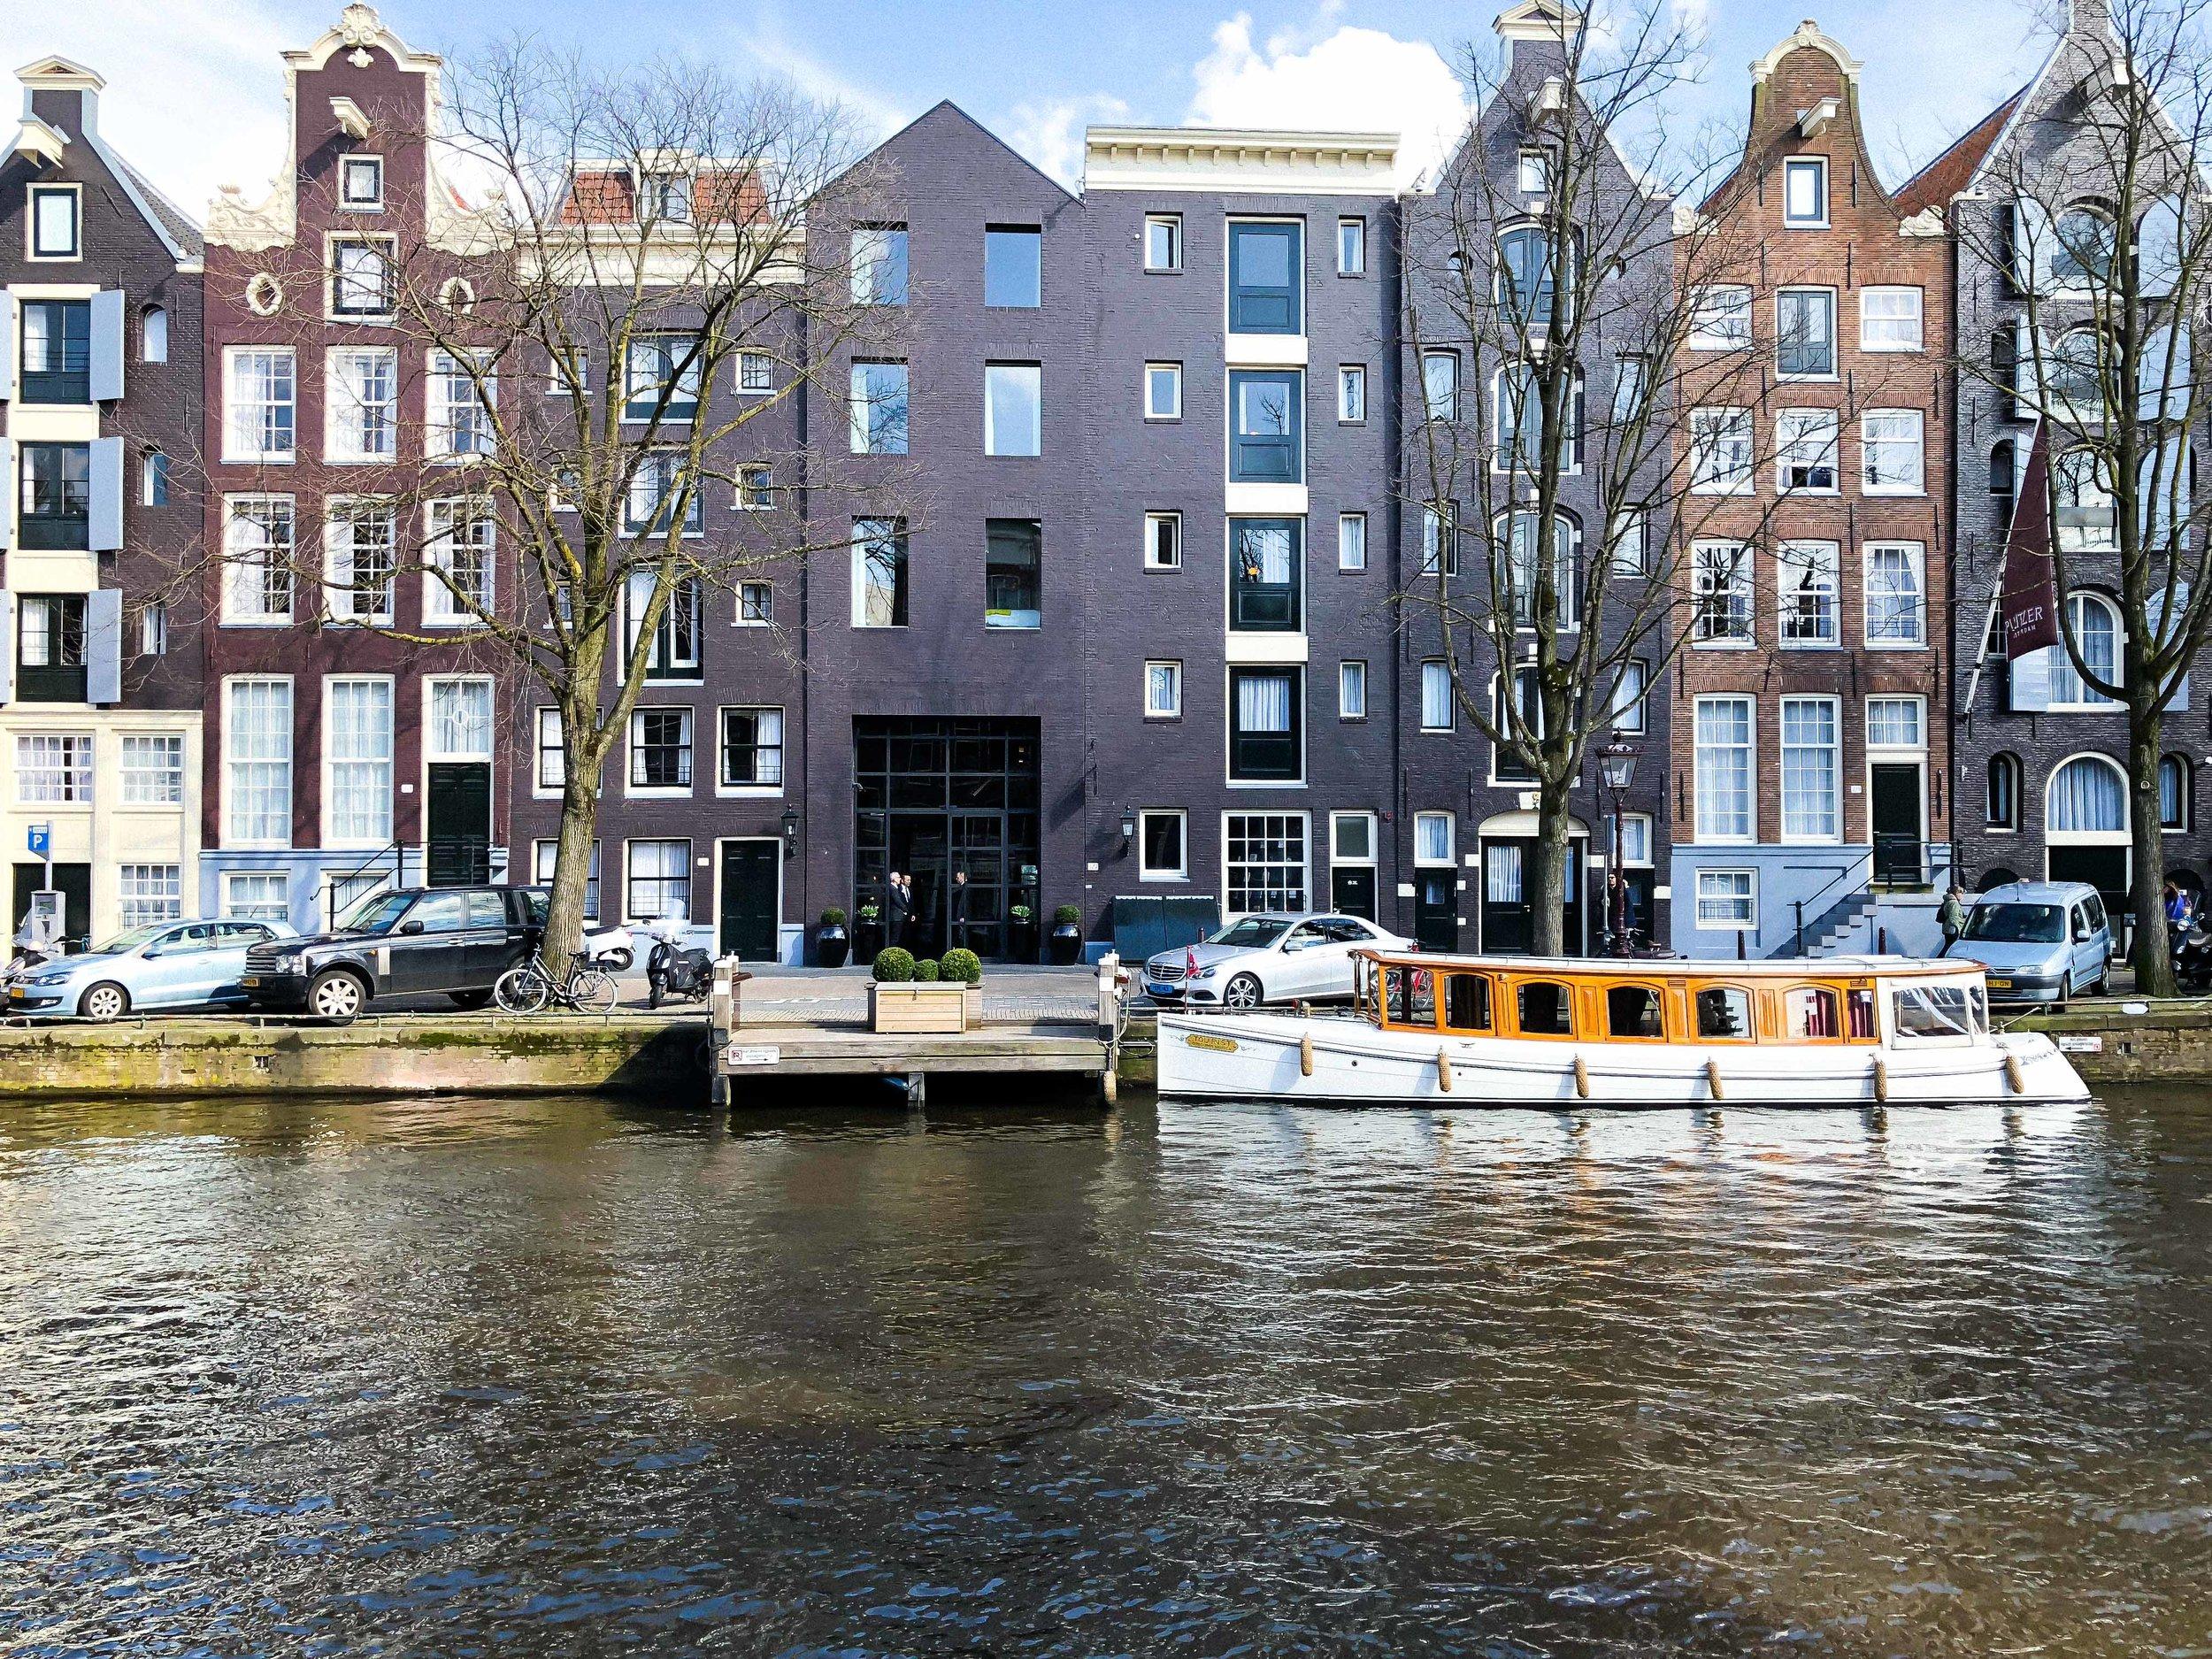 amsterdam_city_guide-16.jpg